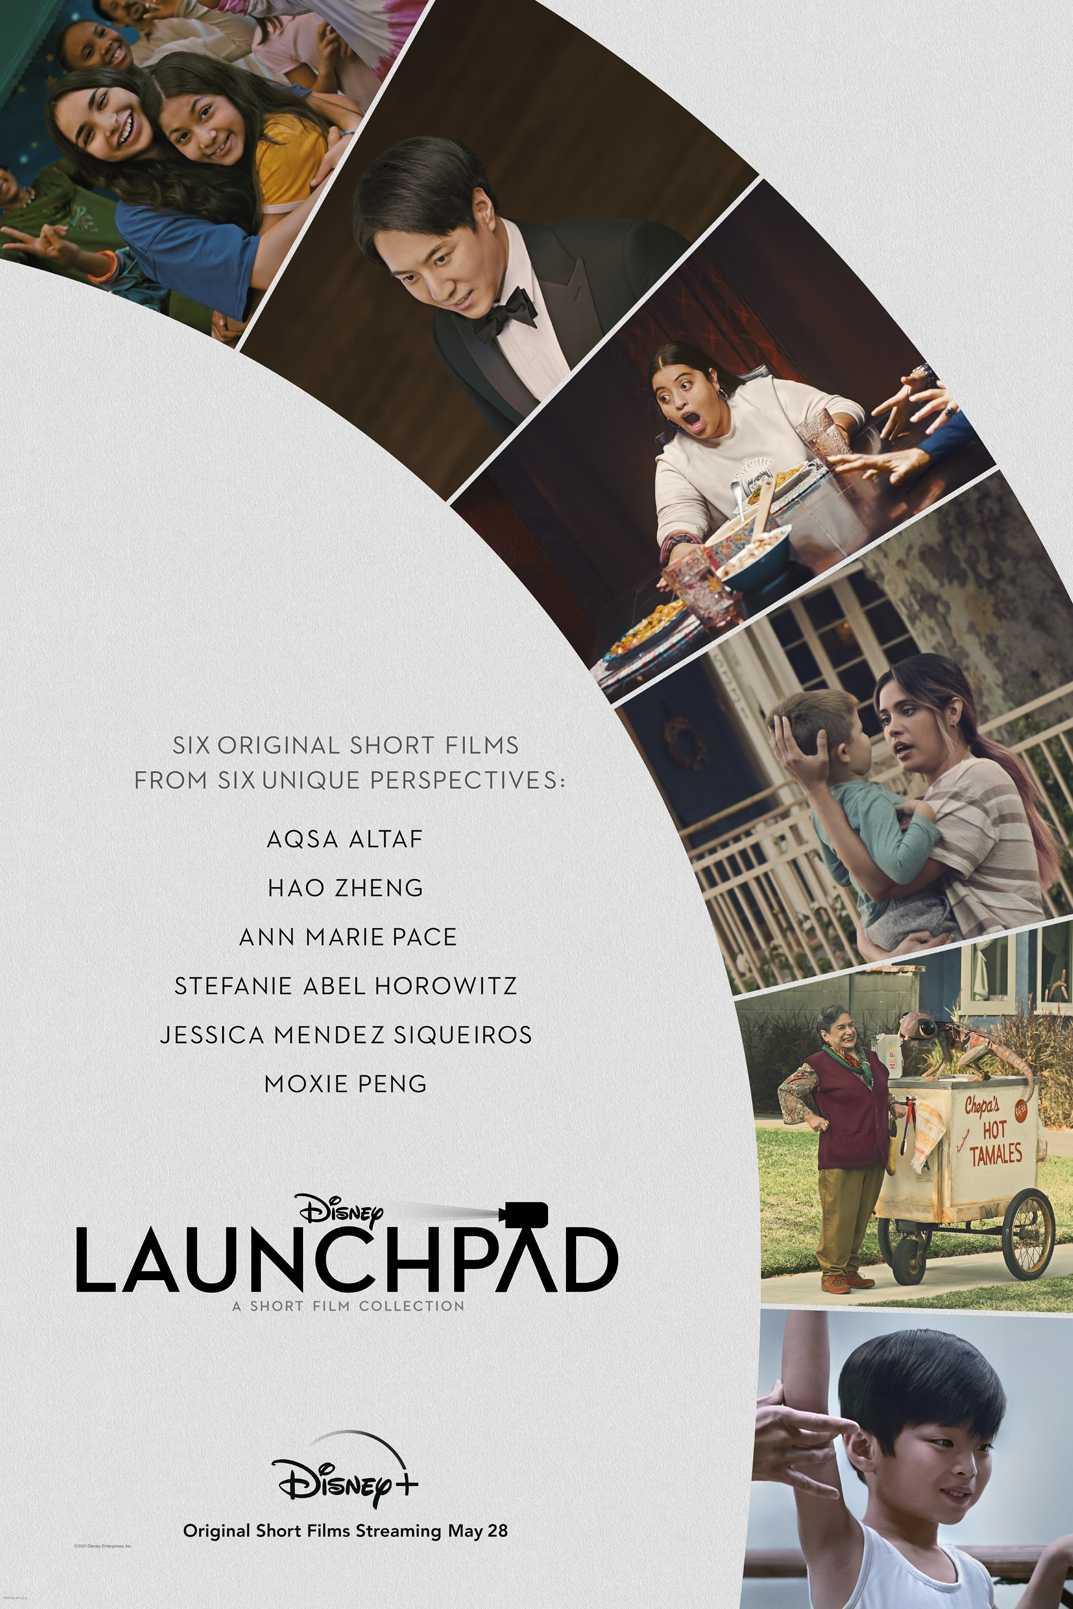 Download Disney+ Launchpad (Season 1) {English With Subtitles} WeB-DL 720p [400MB]